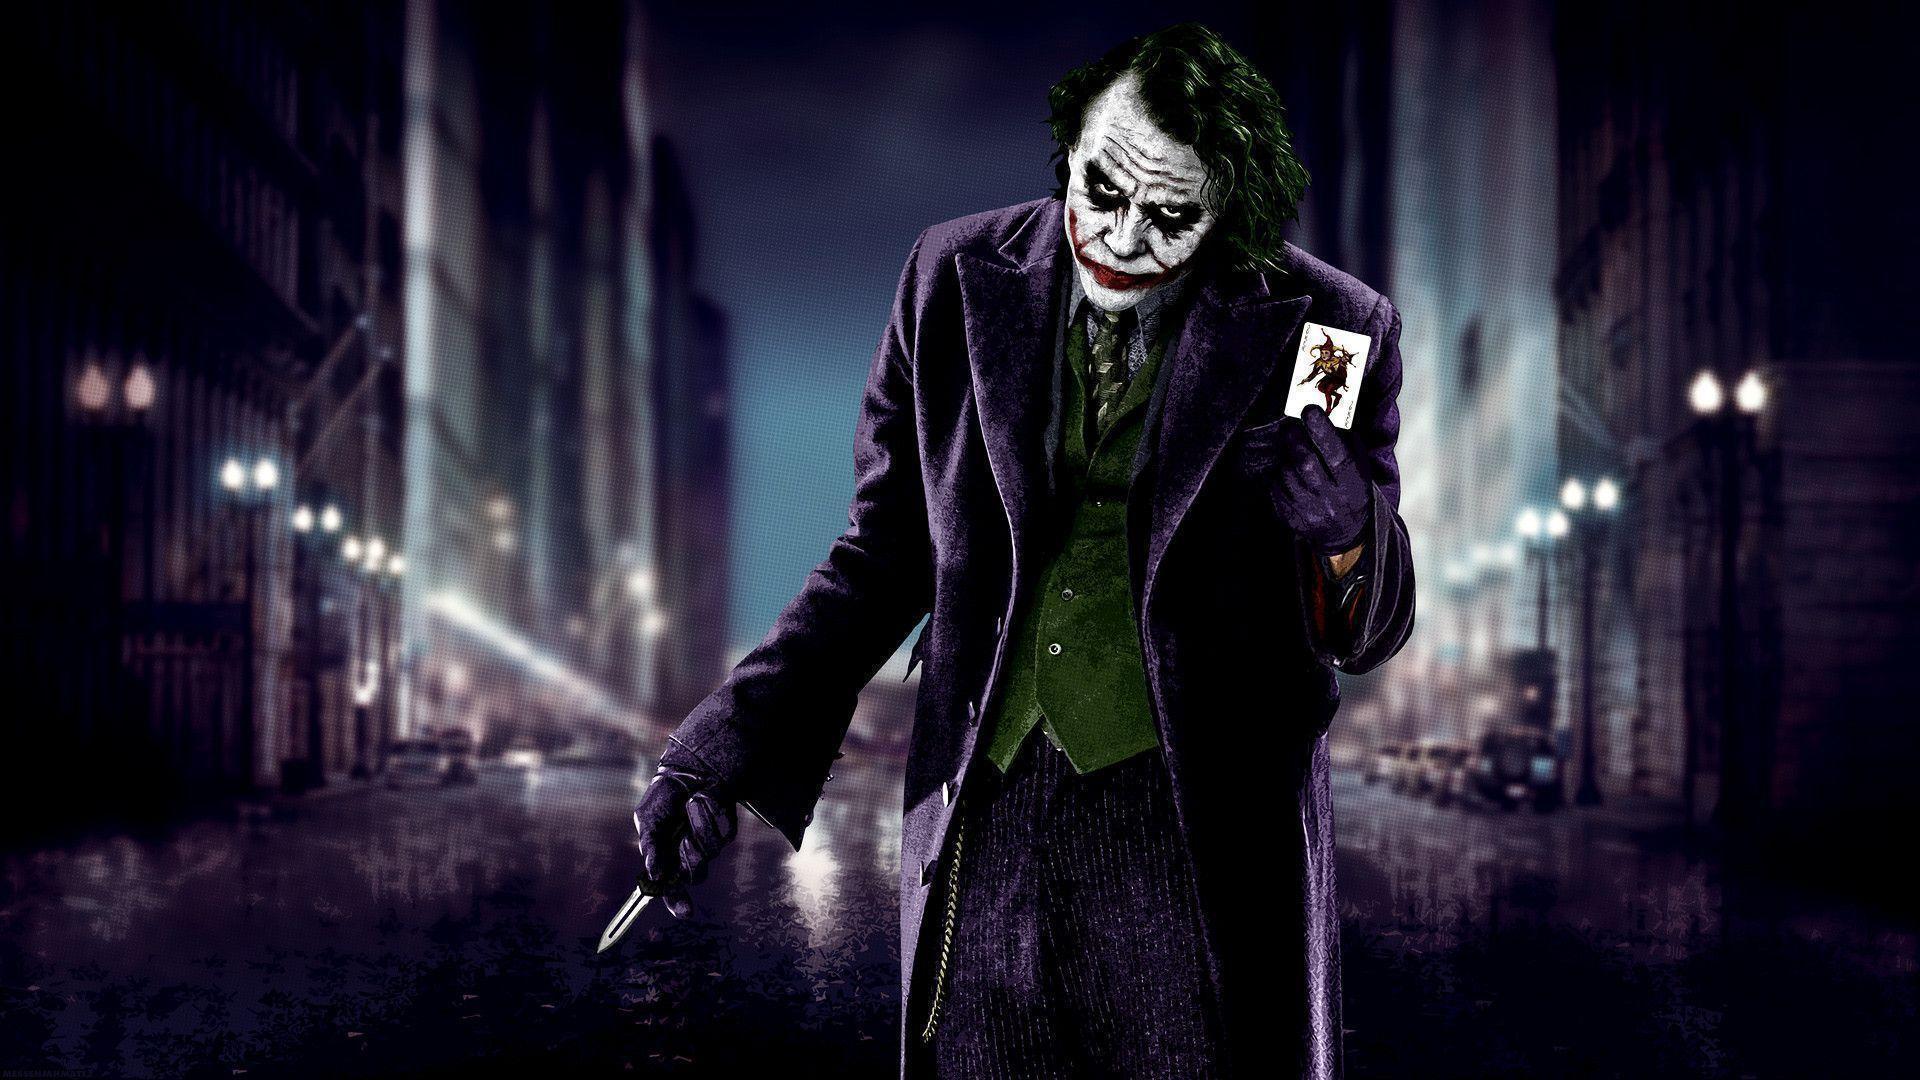 joker wallpaper pc - photo #10